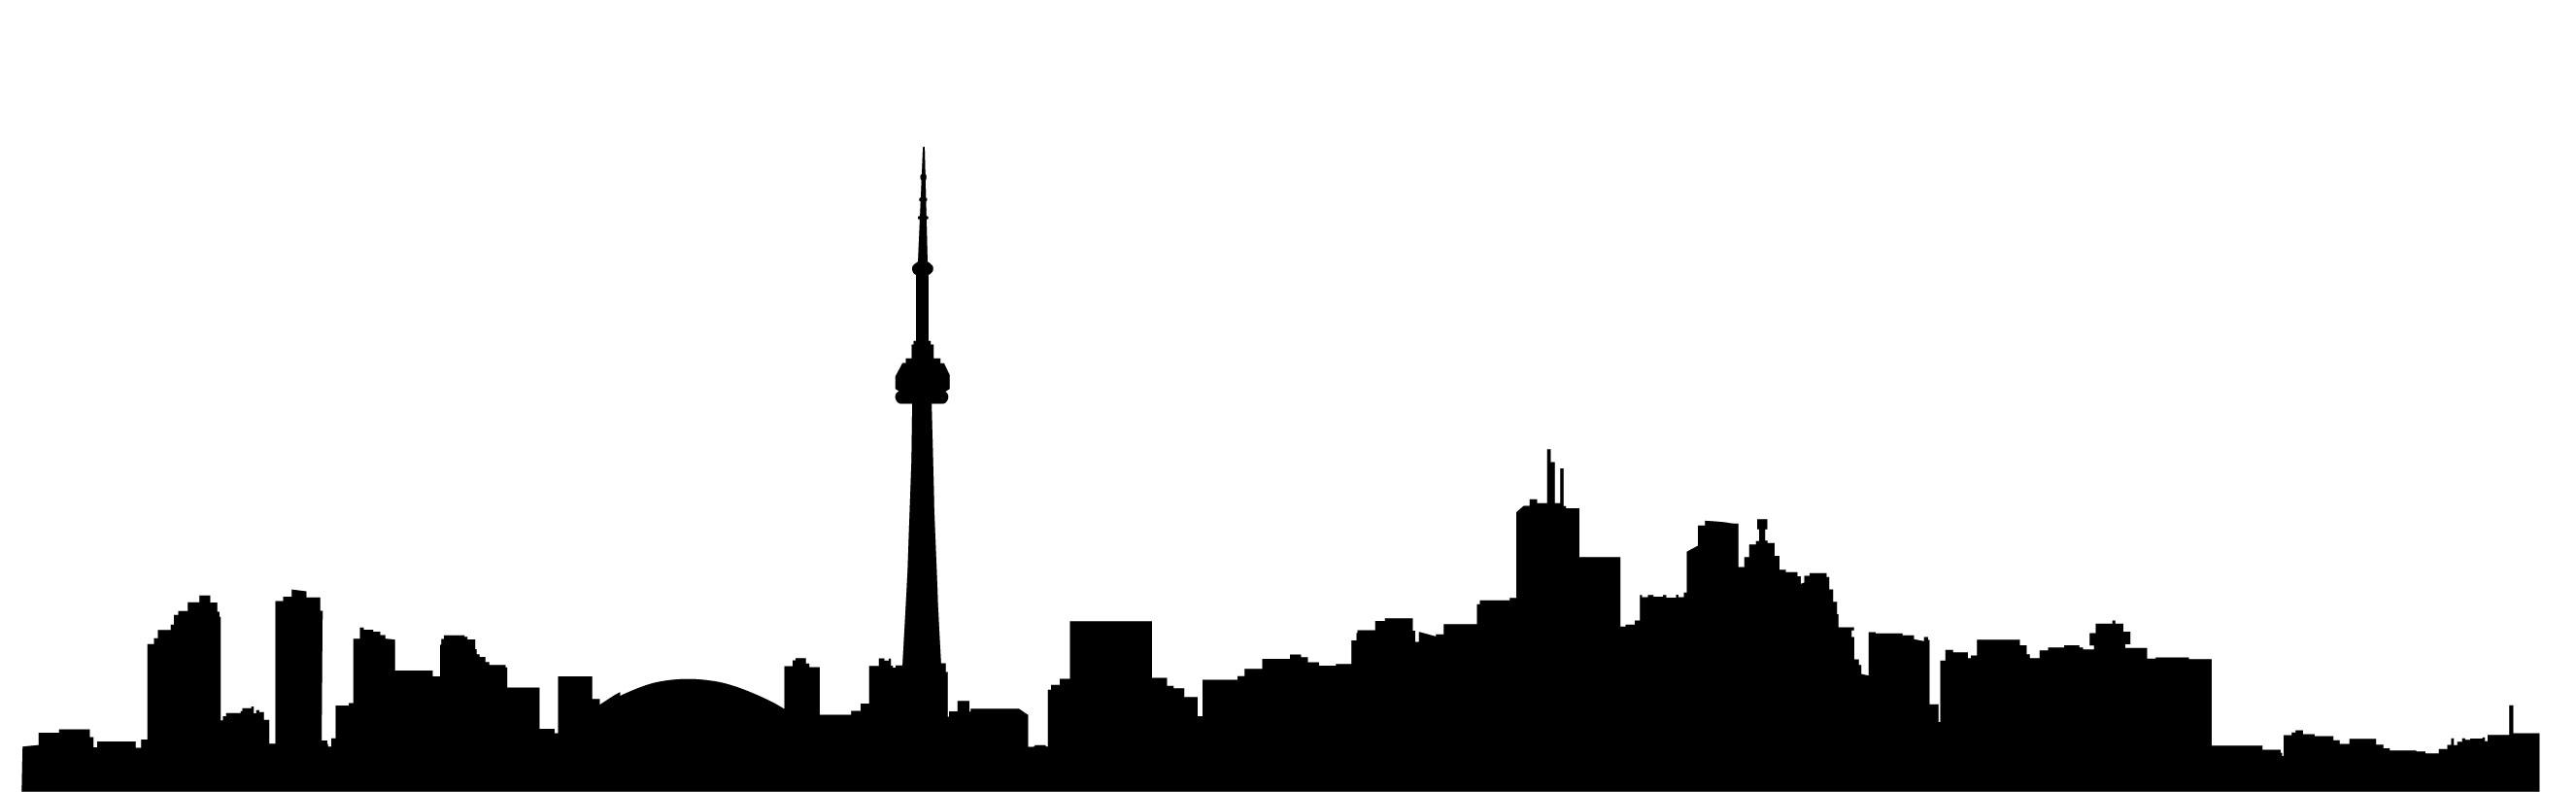 2652x815 Toronto Skyline Silhouette Png